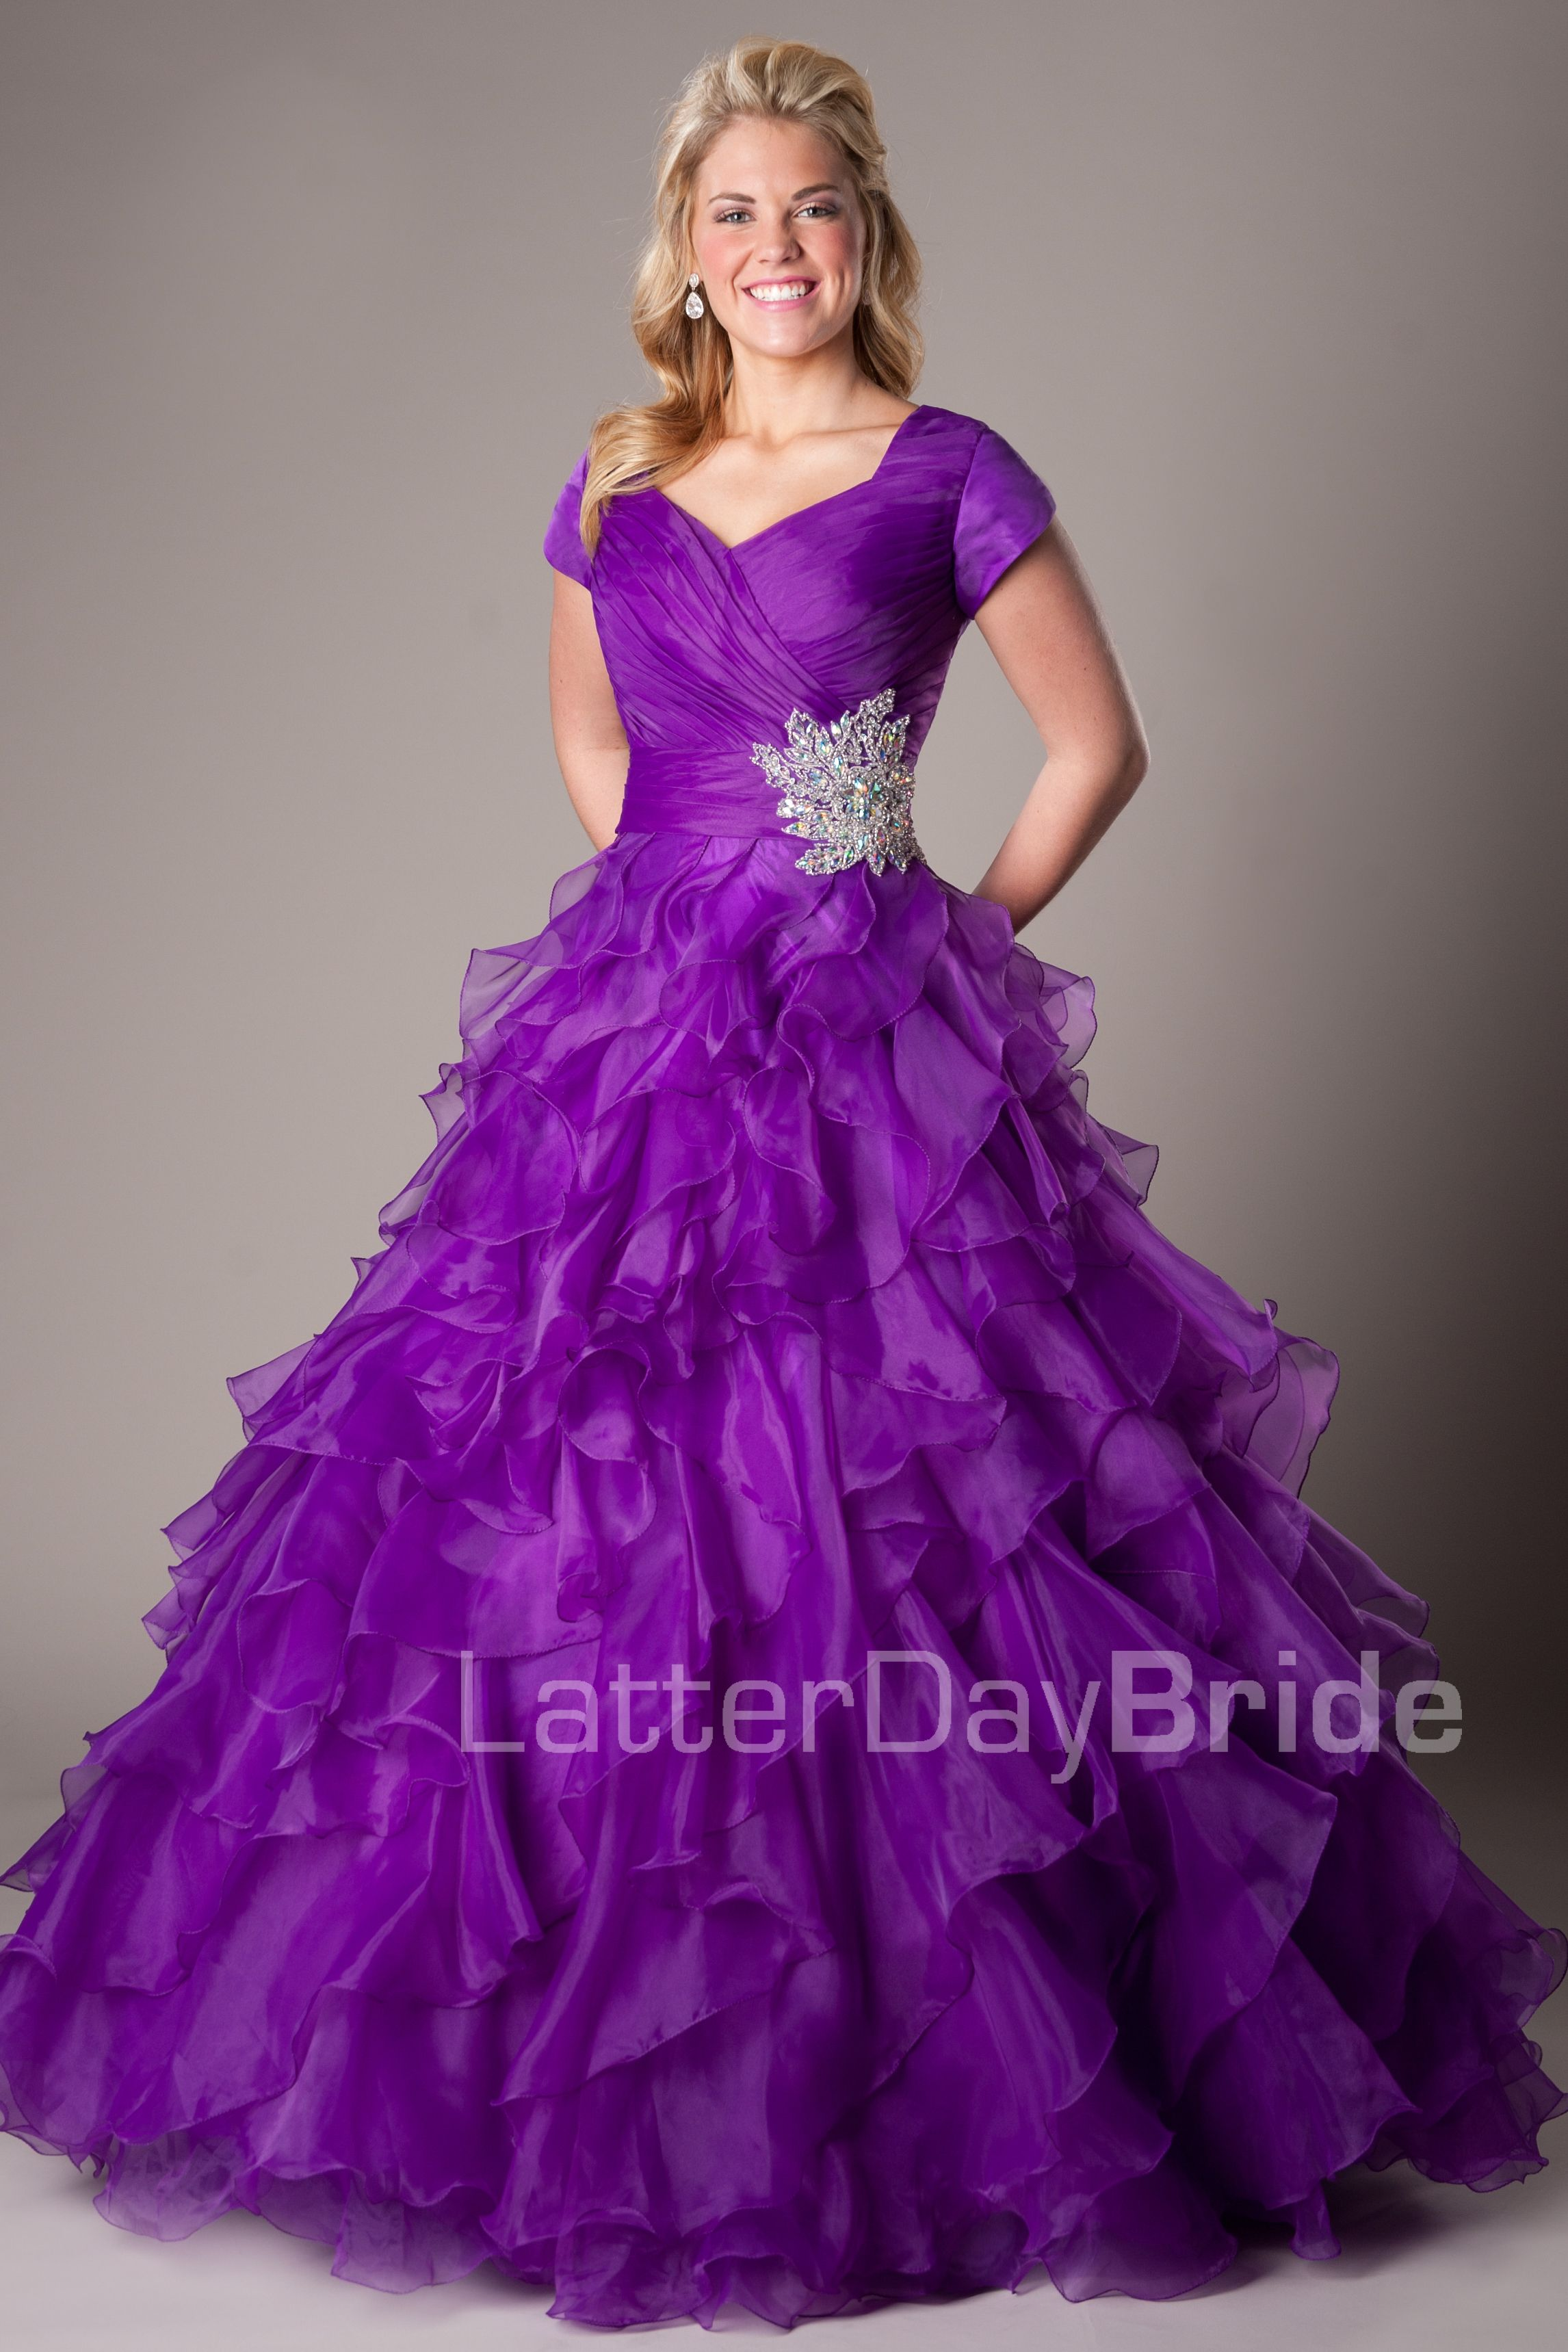 Modest Prom Dresses : Blake -Modest Mormon LDS Prom Dress - Modest ...